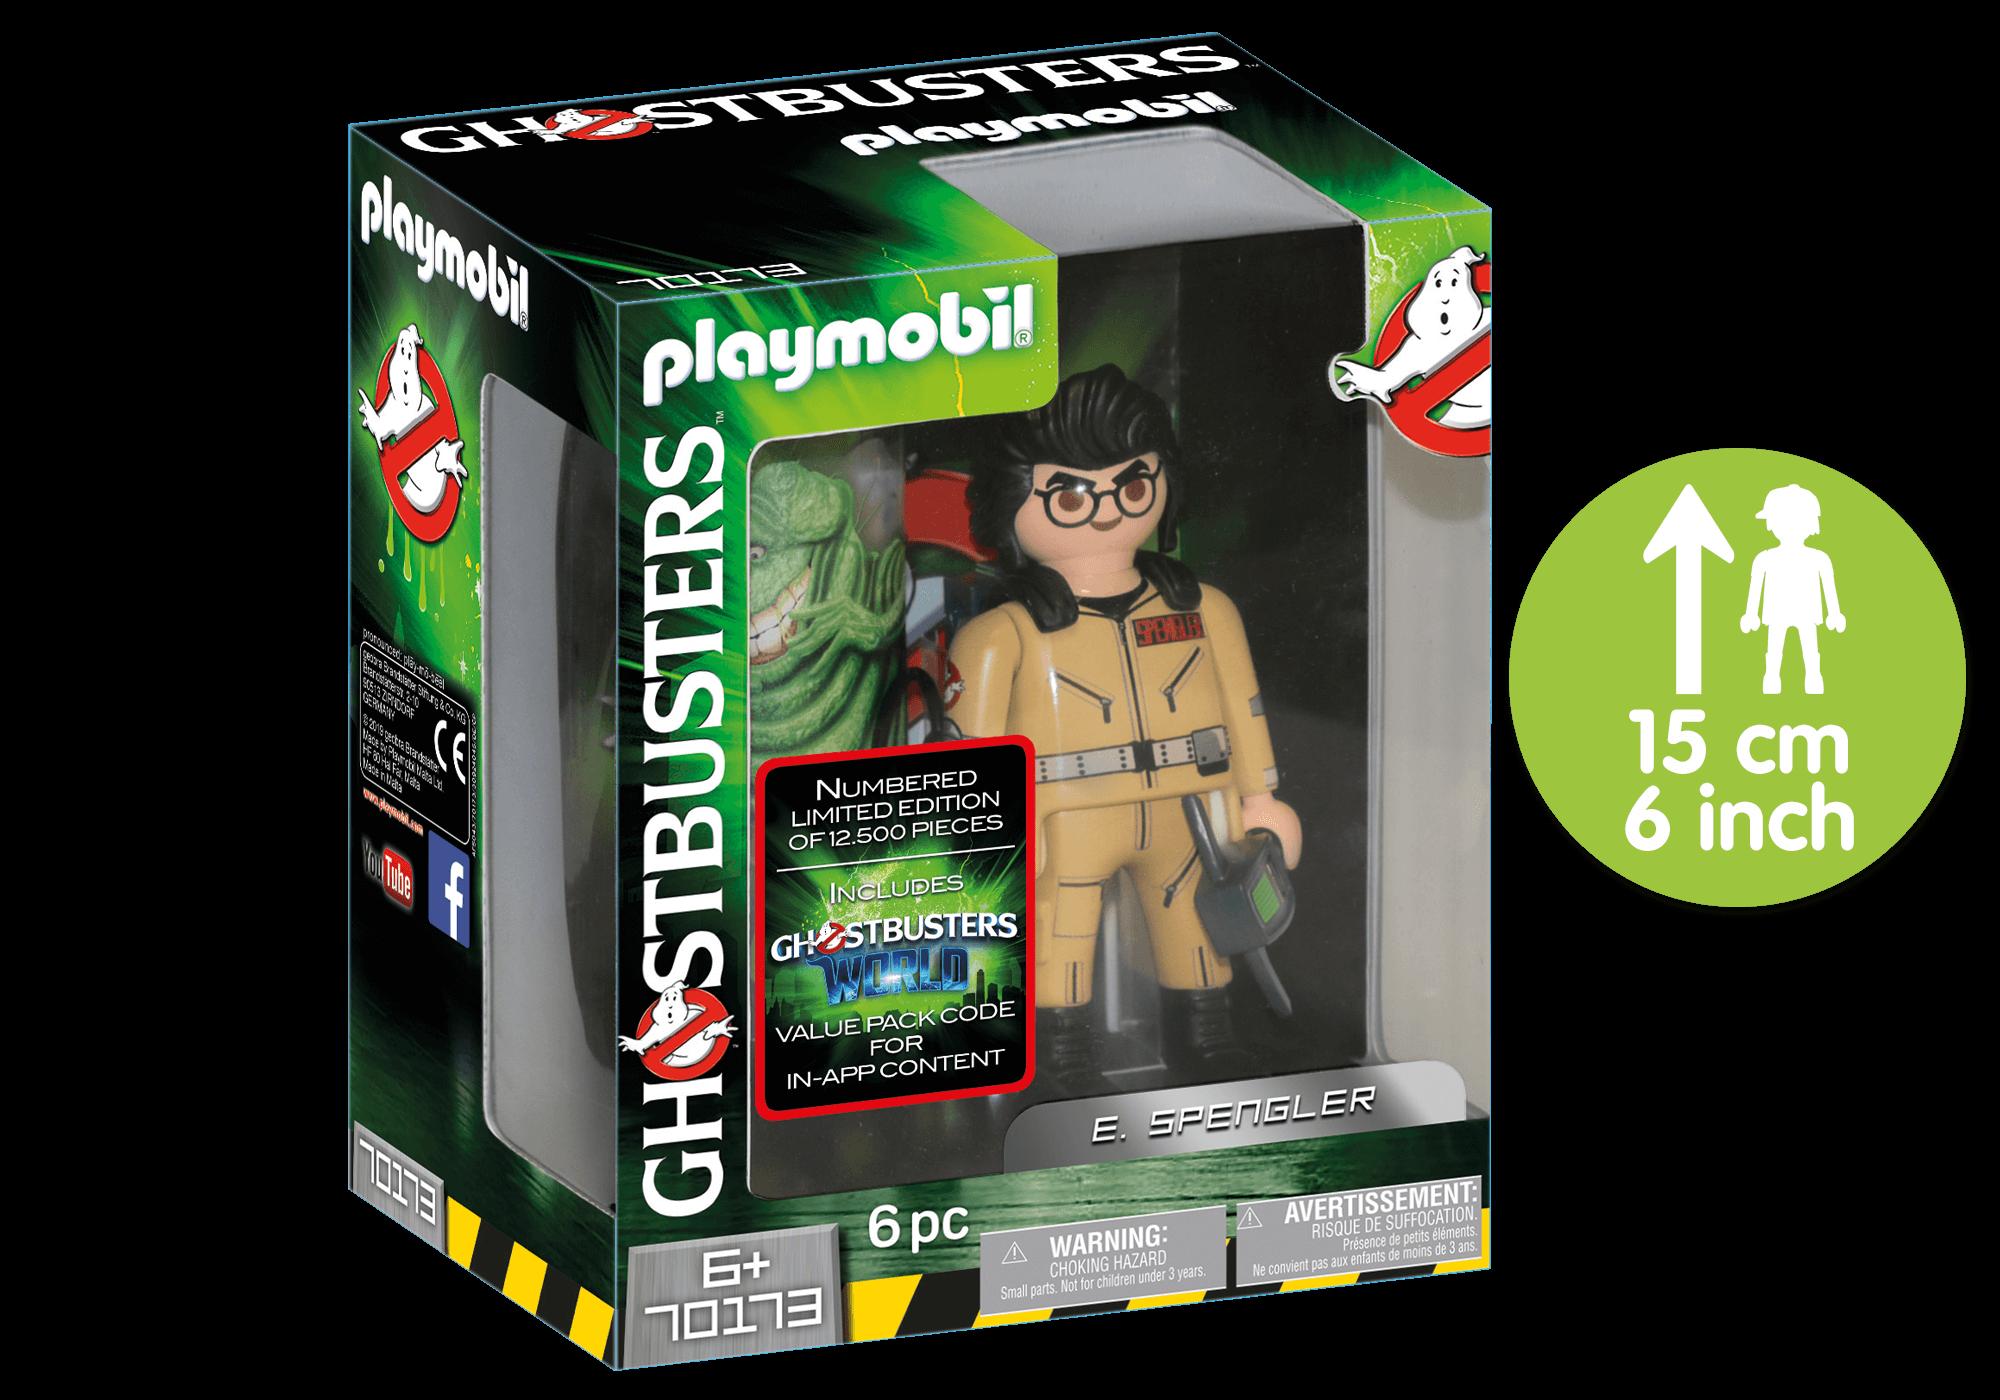 http://media.playmobil.com/i/playmobil/70173_product_detail/Ghostbusters™ Samlarutgåva E. Spengler